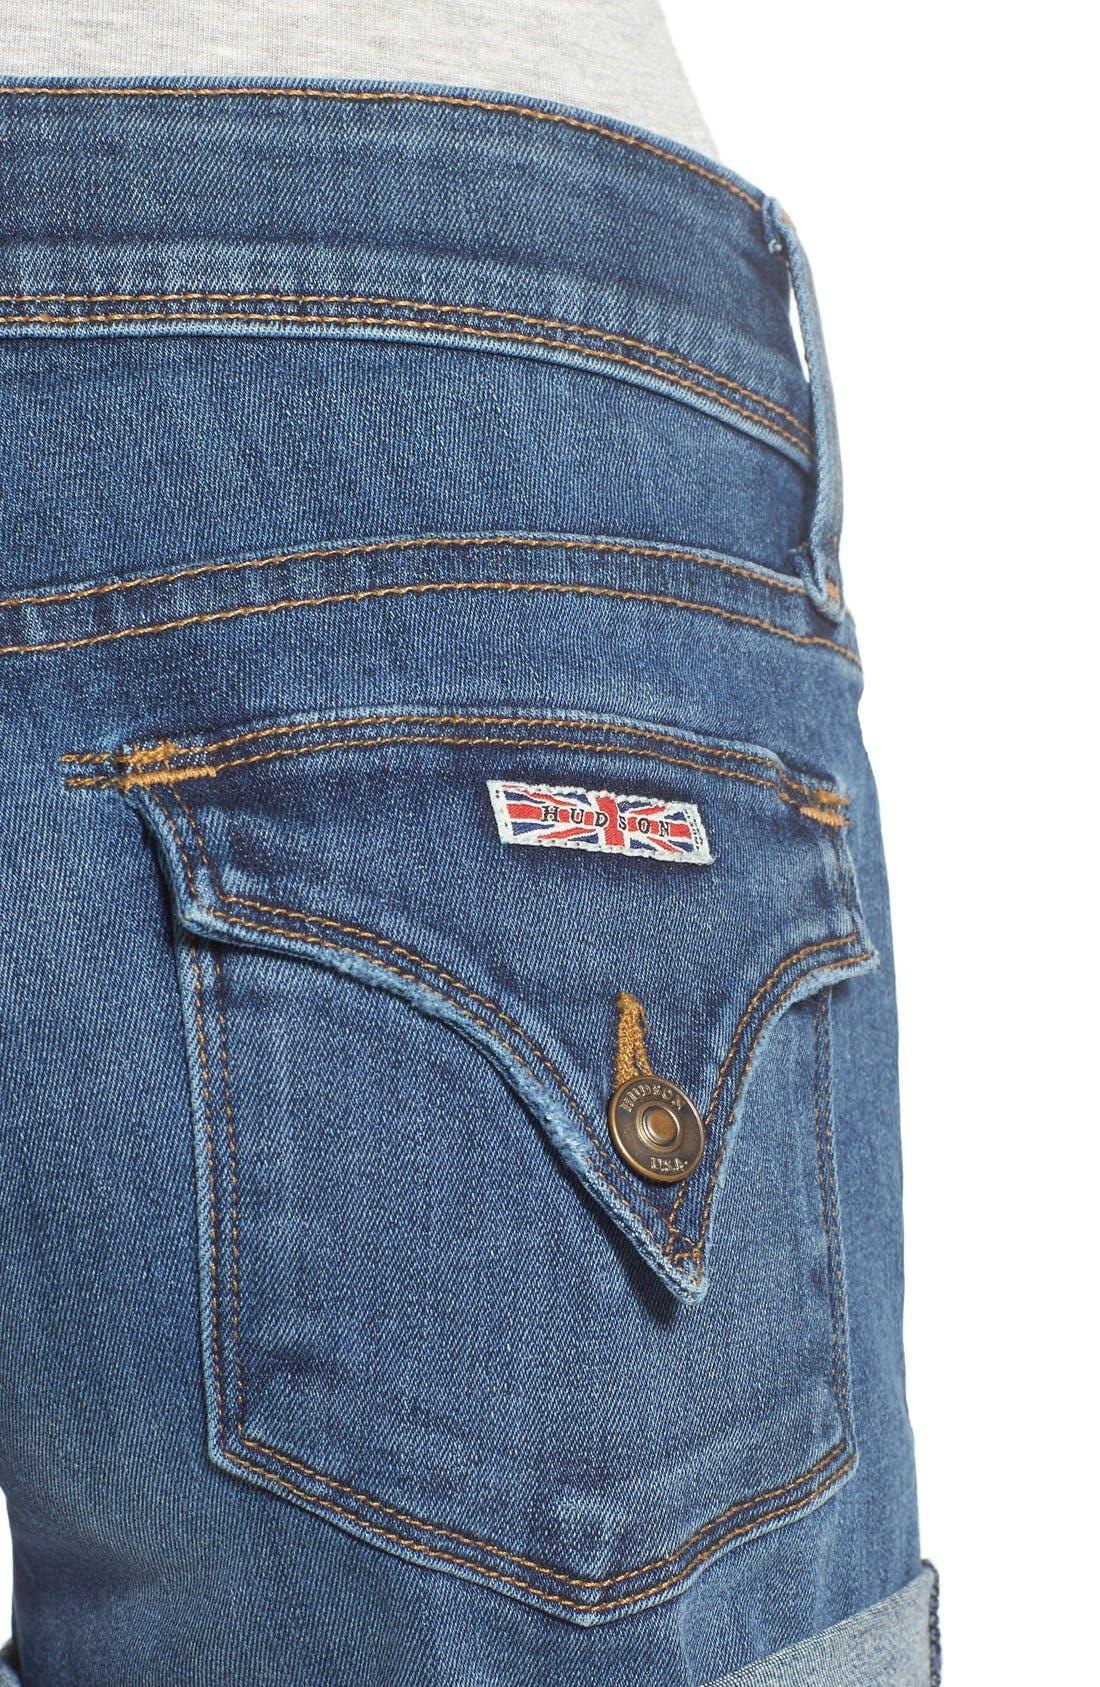 'Croxley' Cuffed Denim Shorts,                             Alternate thumbnail 4, color,                             Advantageous